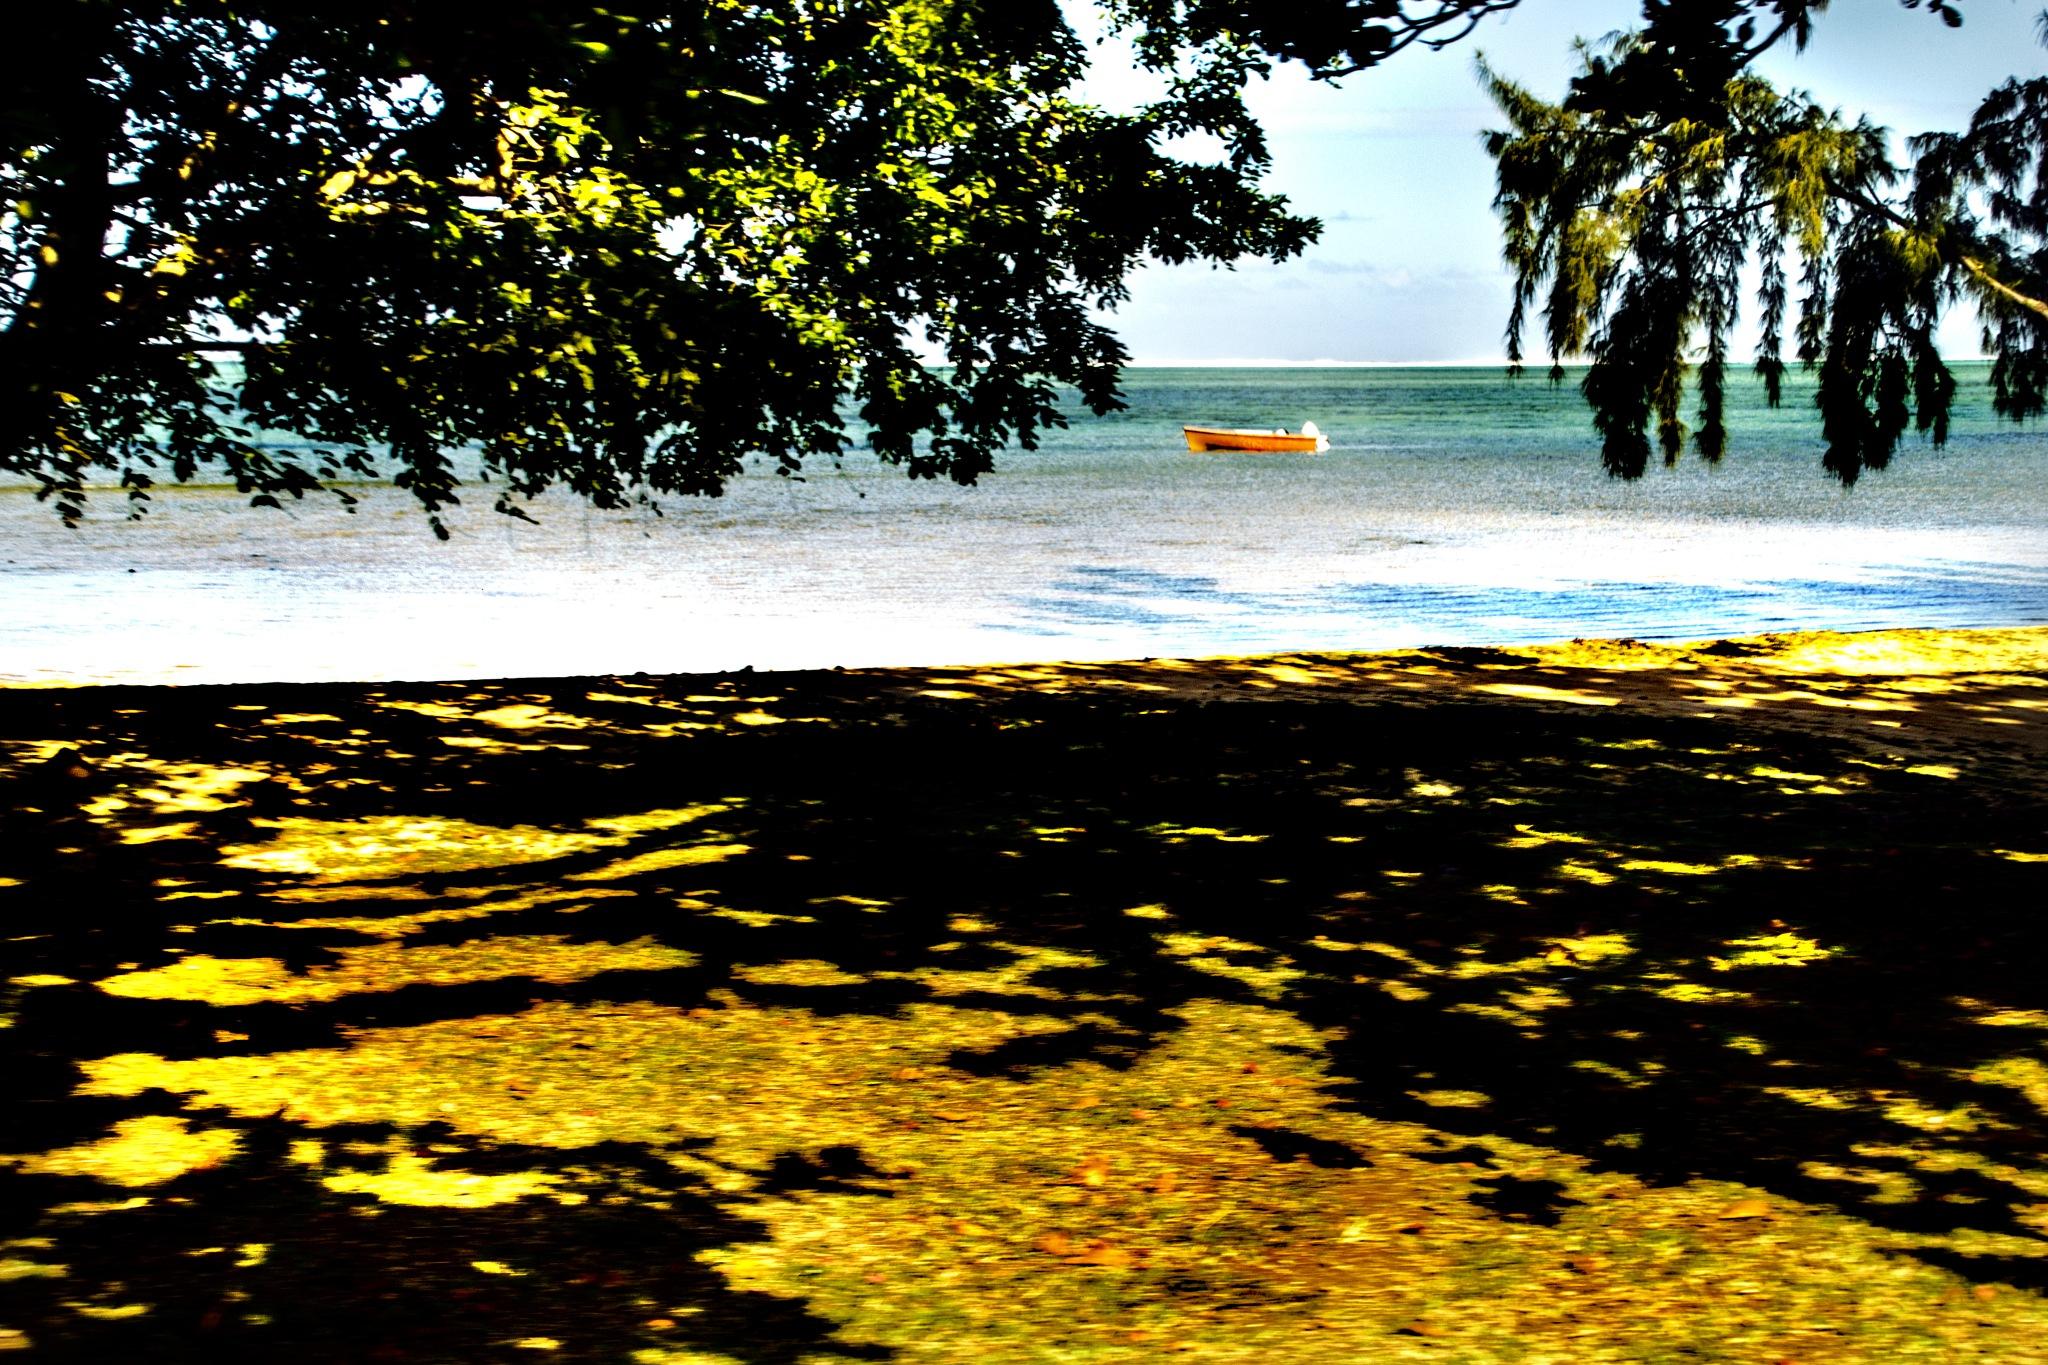 Little boat by Nauta Piscatorque